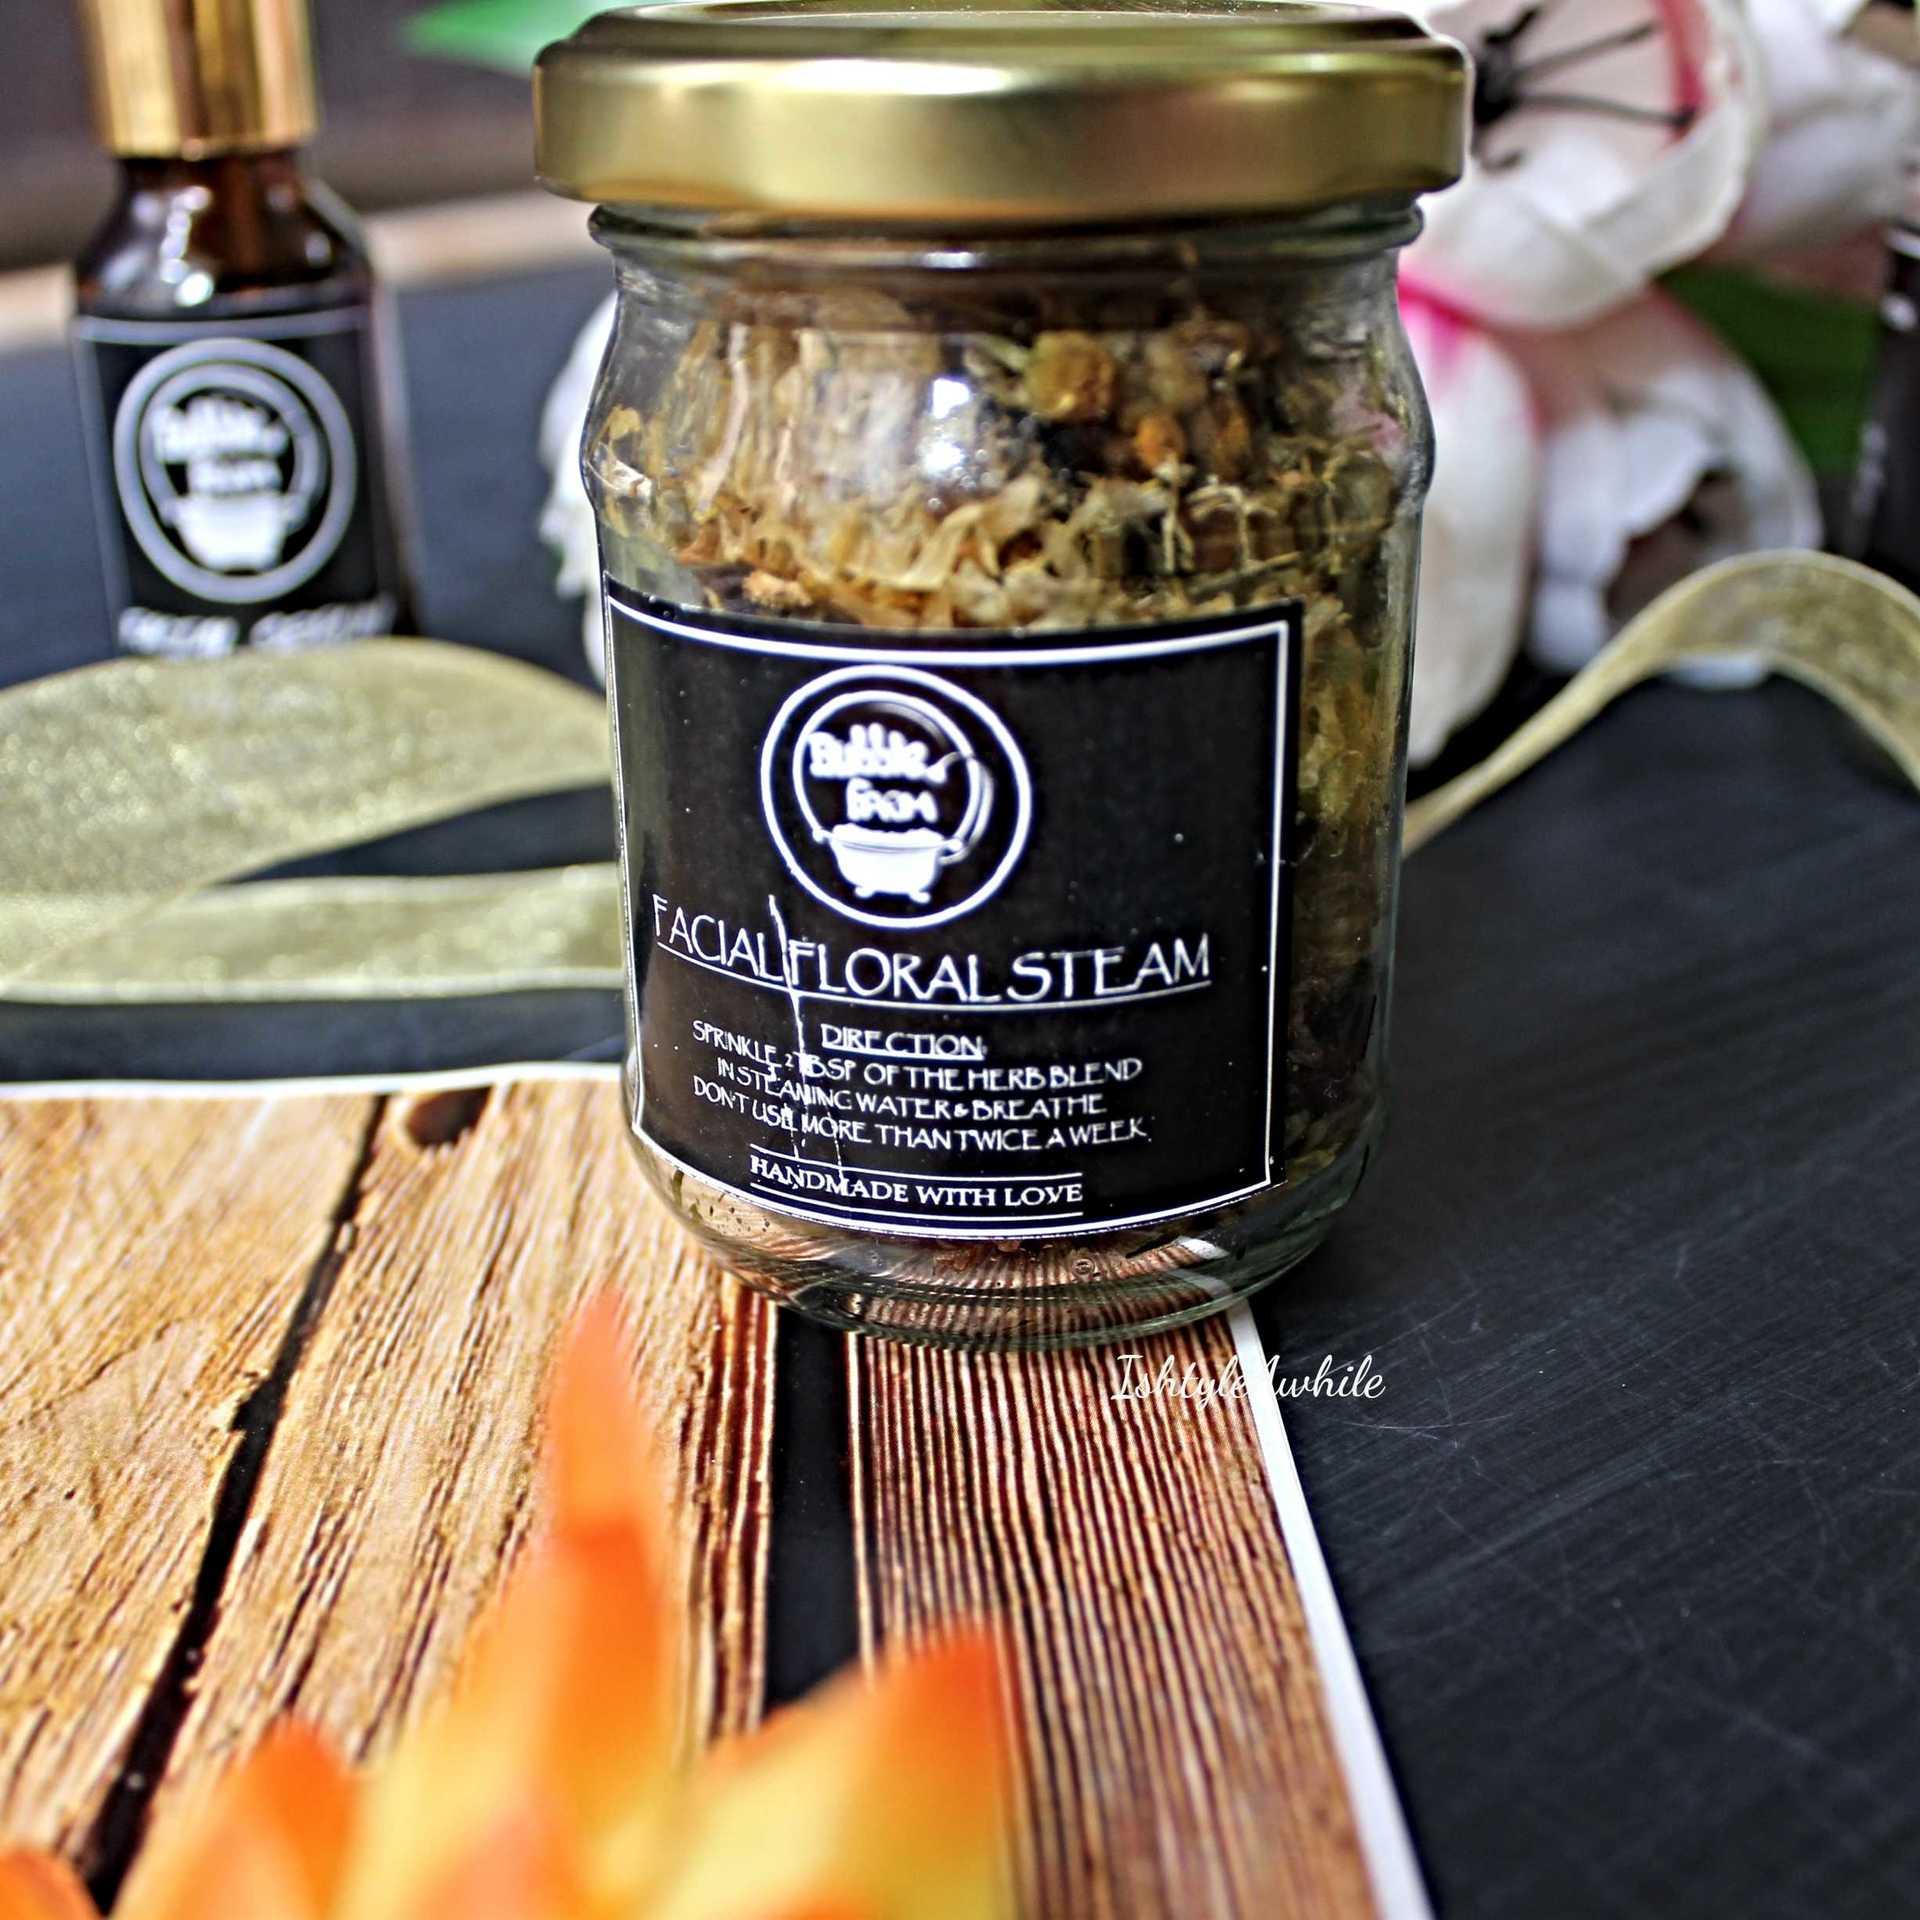 IshtyleAwhile - A Chennai based Indian Fashion Blog - Facial Floral Steam bubble farm skincare products